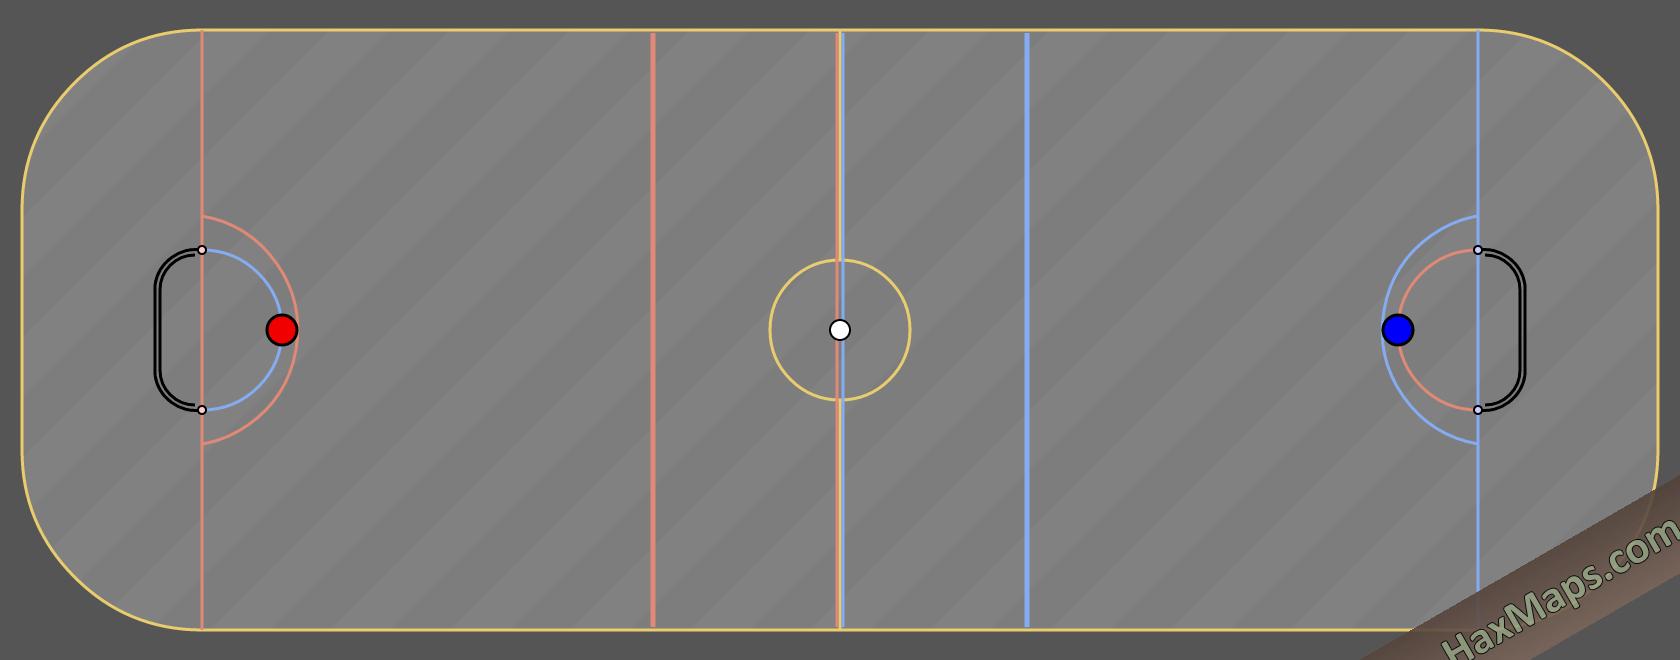 hax ball maps | нормич хоккей